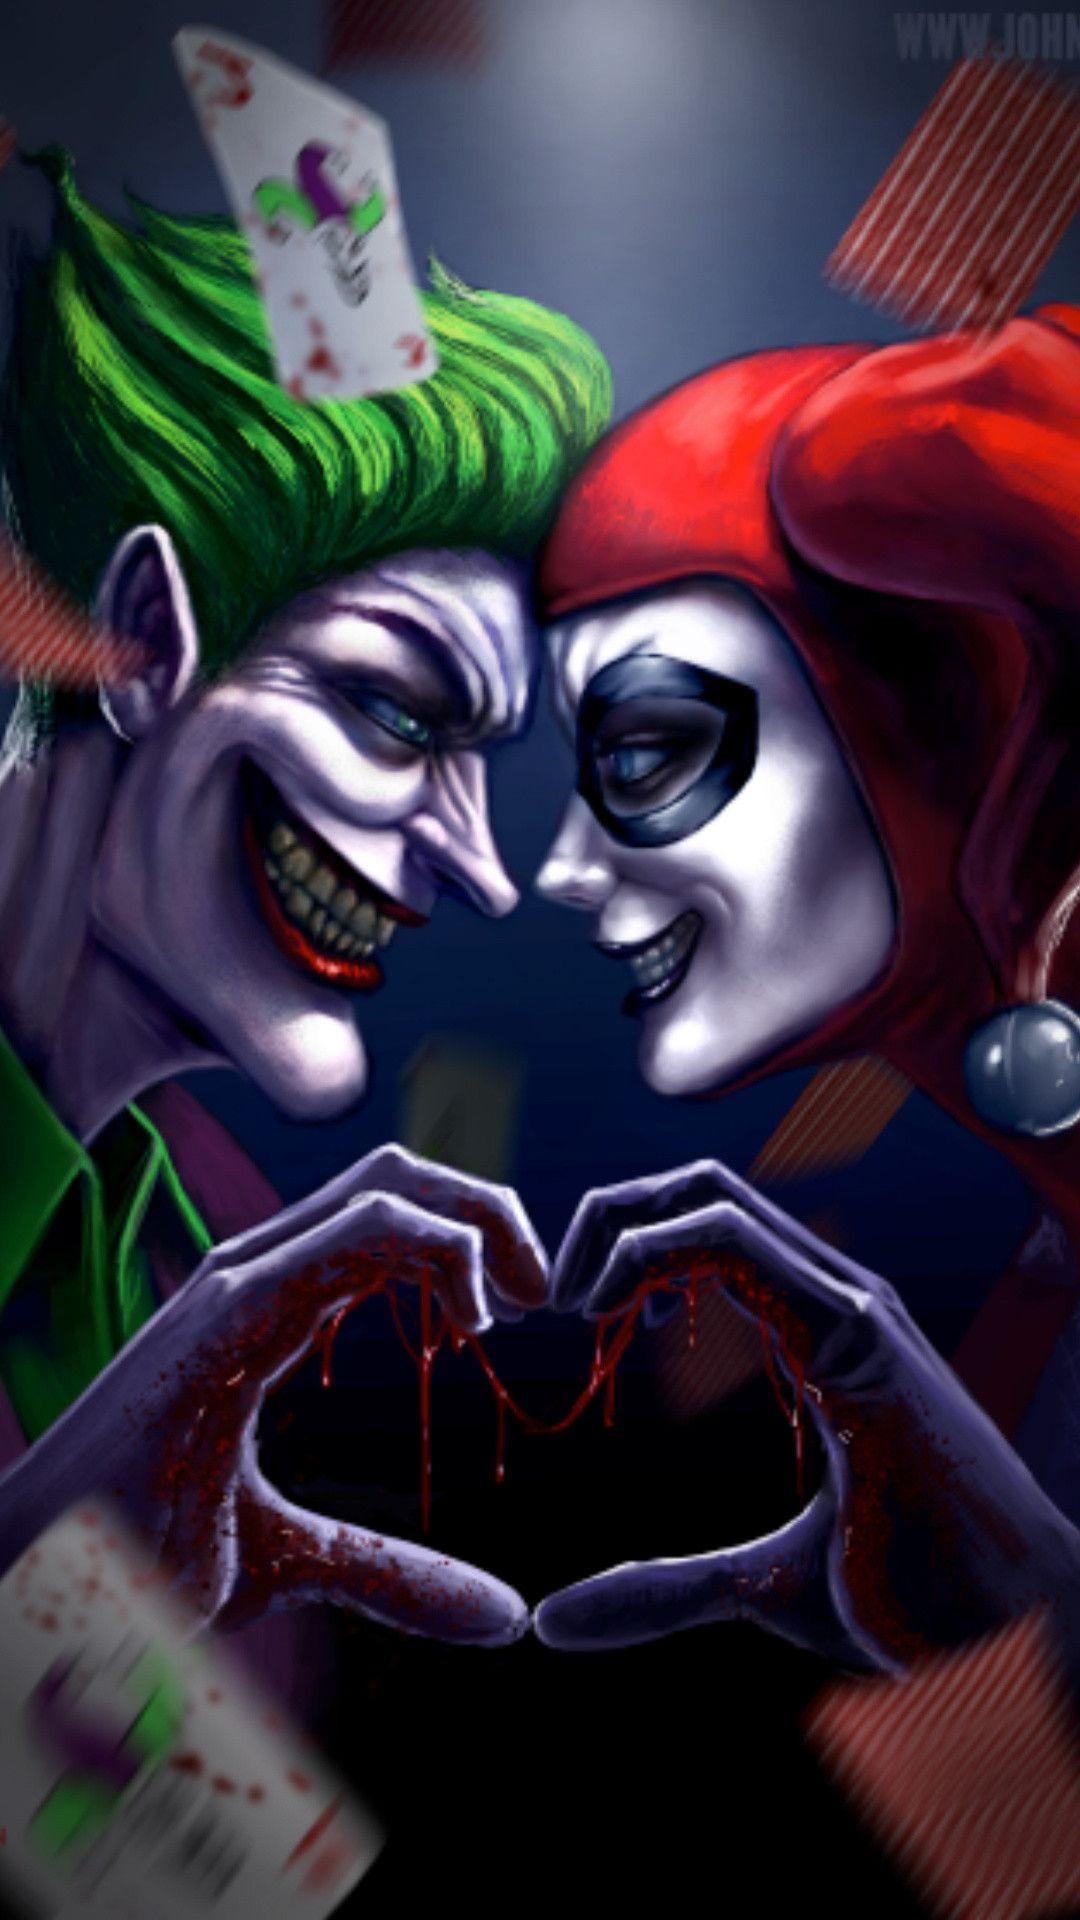 Pin By Rasha Raoof On Poster In 2020 Harley Quinn Drawing Joker Hd Wallpaper